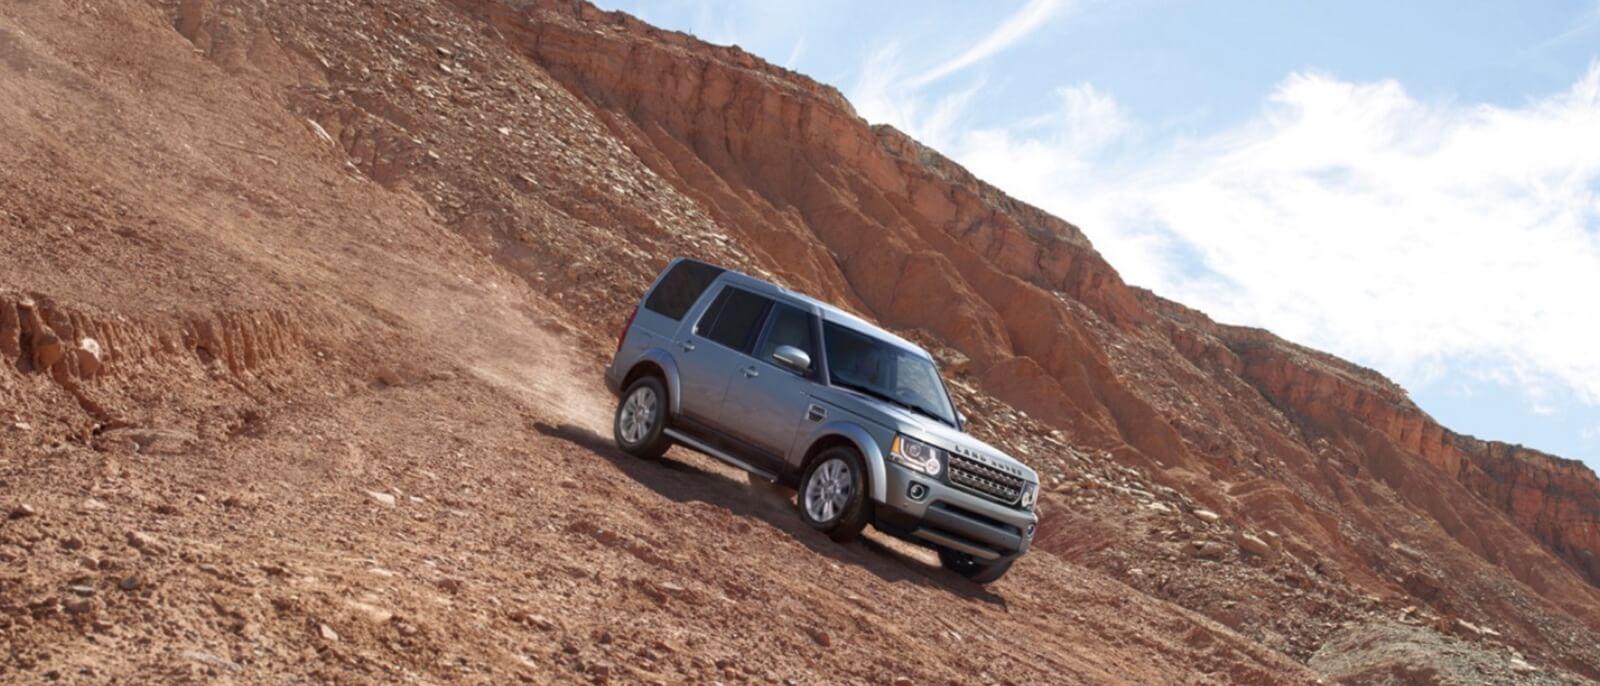 2016-Land-Rover-LR4-Slider-2